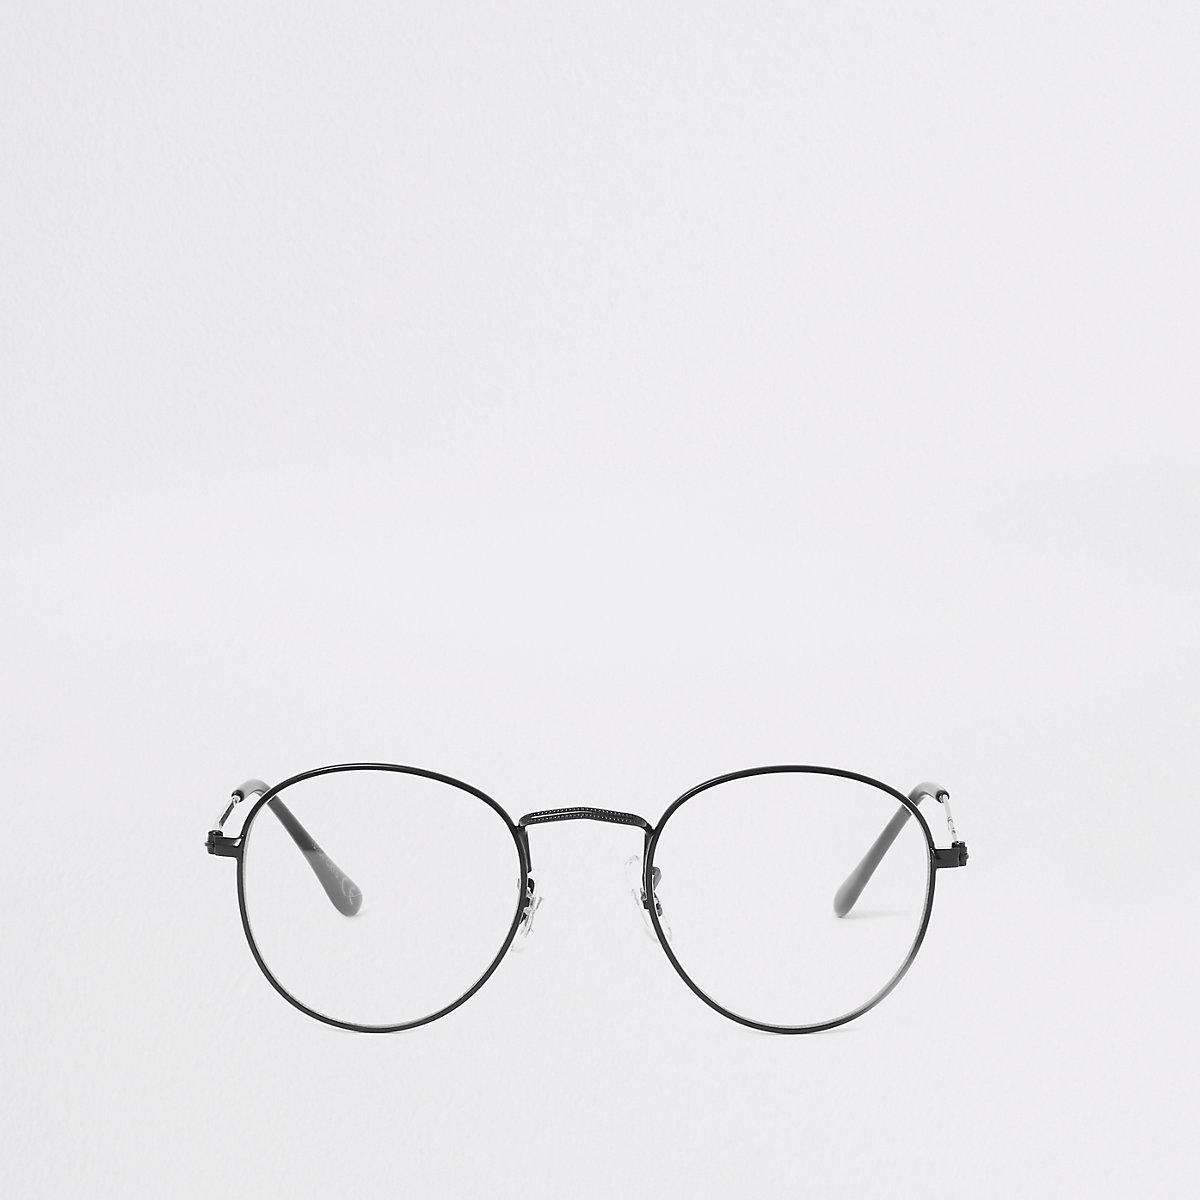 Black round clear lens glasses